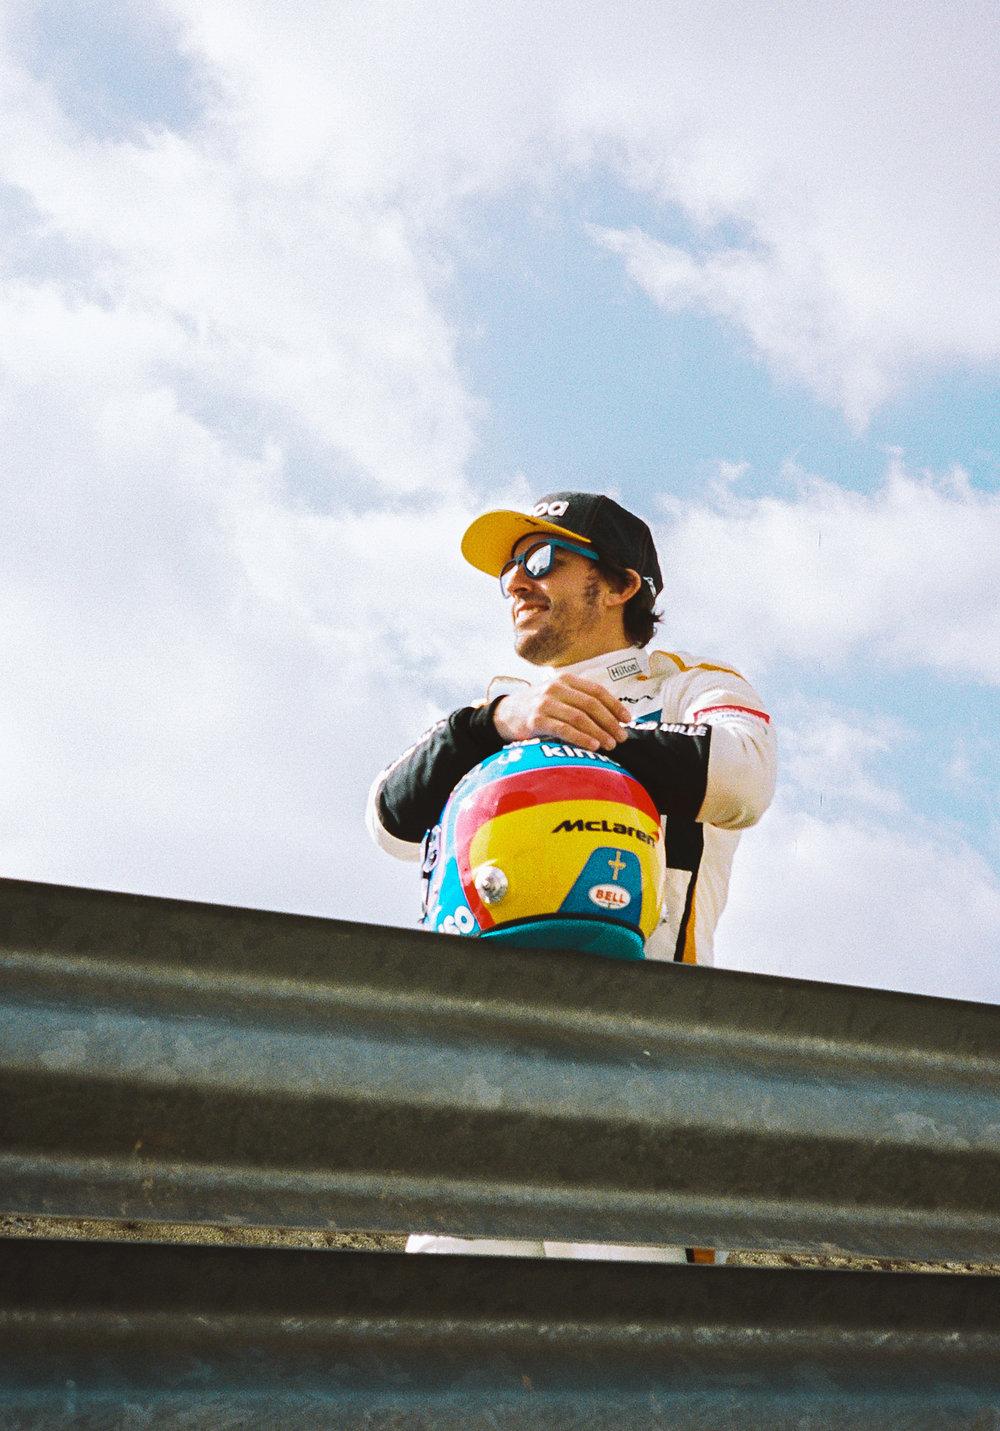 Fernando Alonso, McLaren. 2018 FIA Formula 1 Championship.